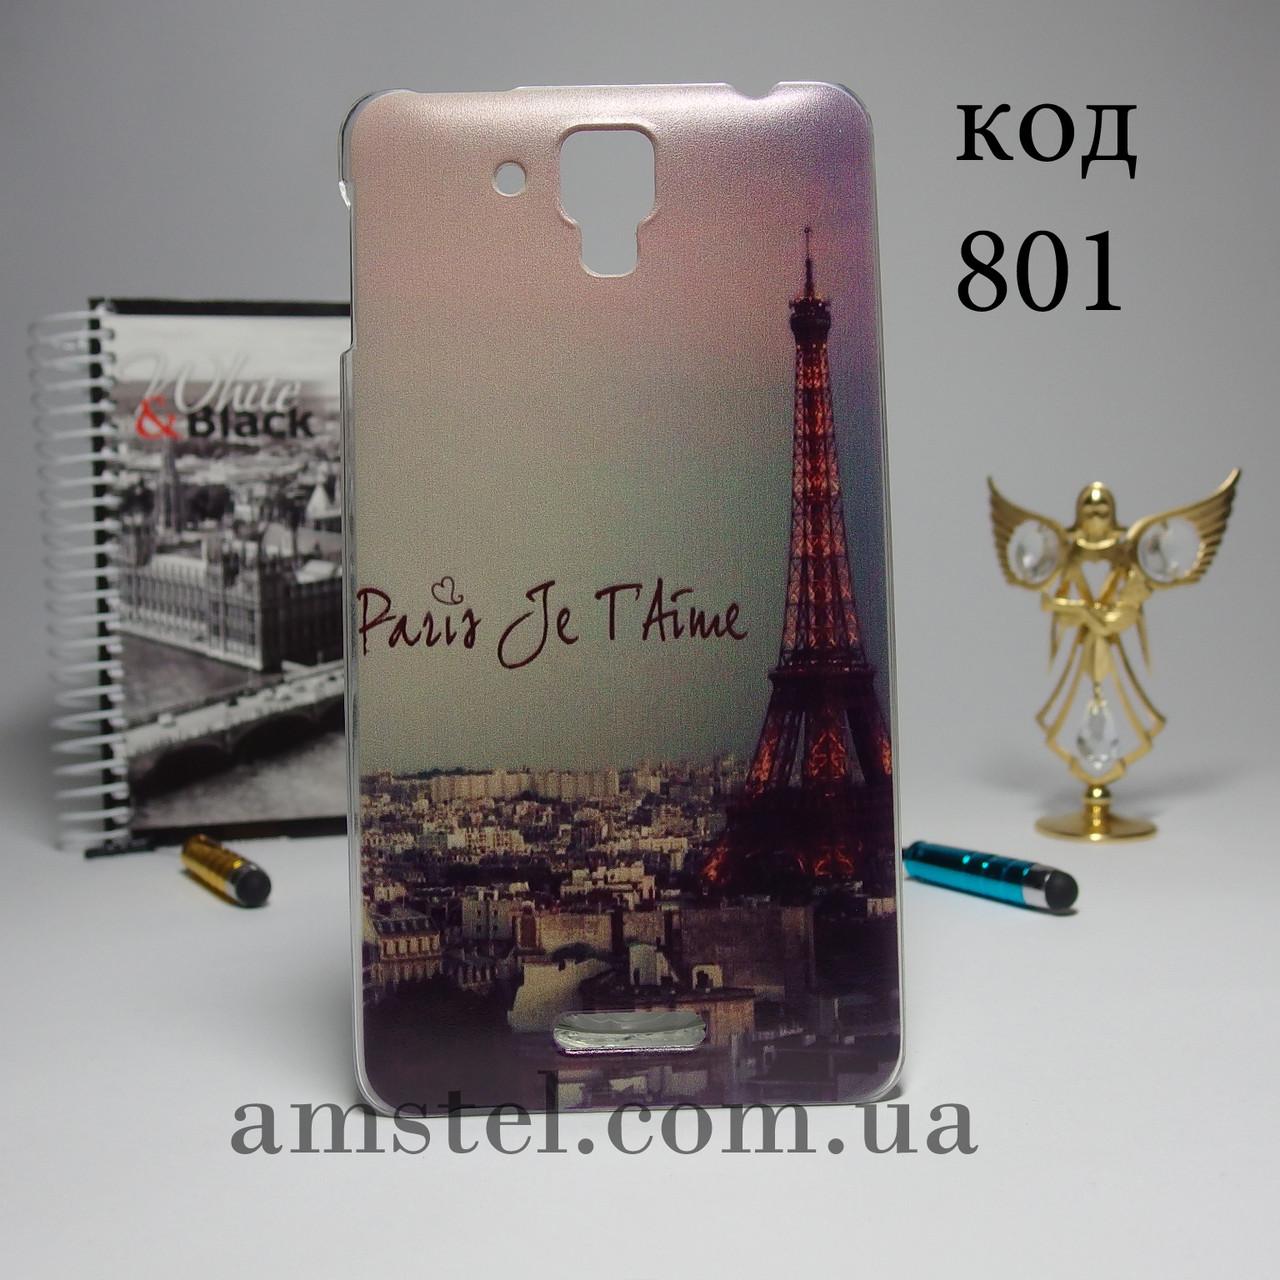 Чехол для lenovo s898t панель накладка с рисунком Париж